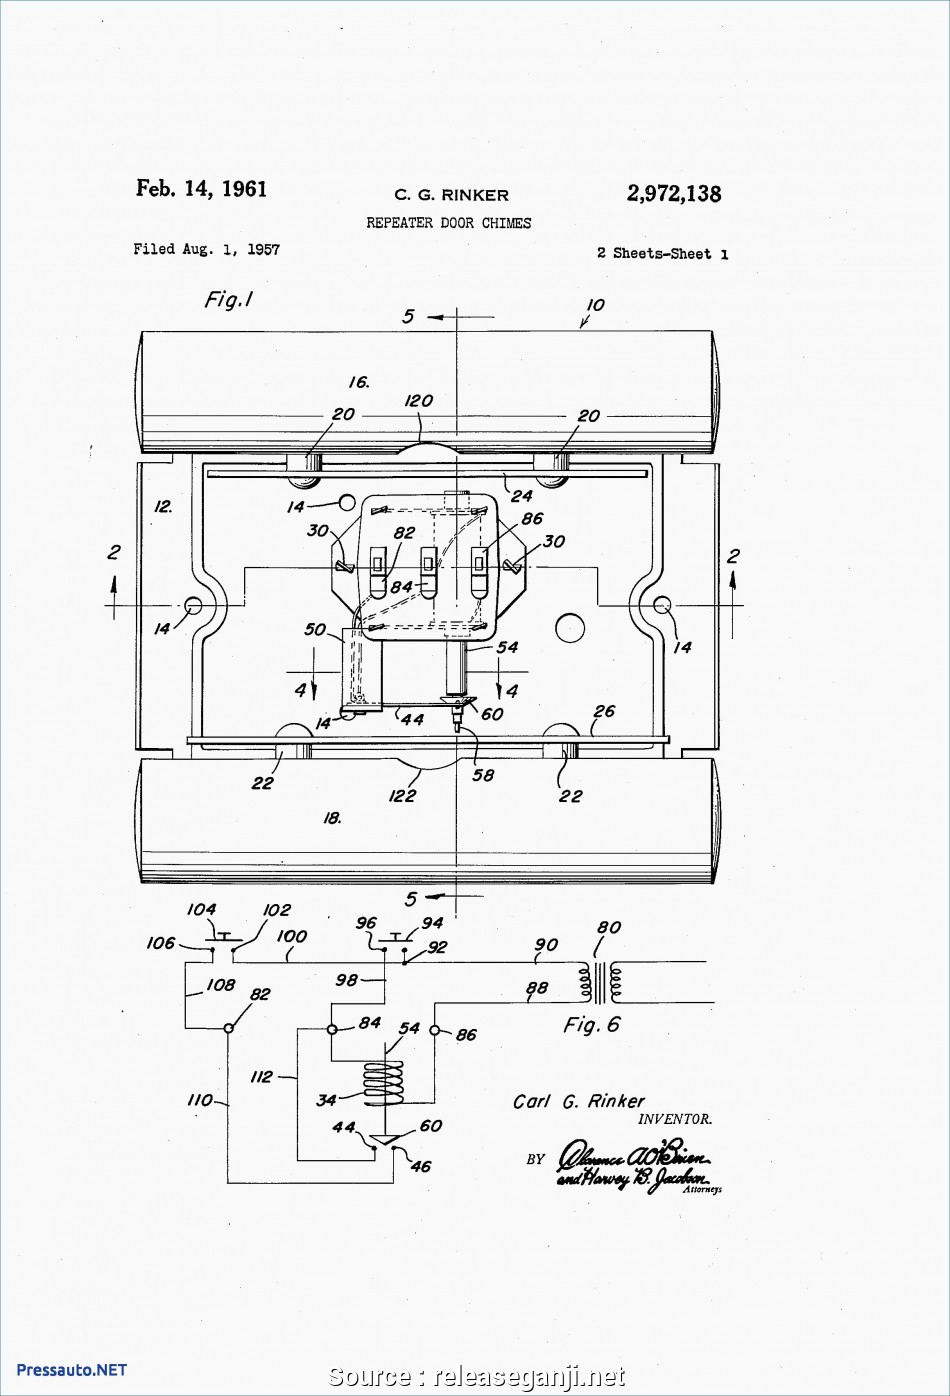 Doorbell Wiring Schematic Diagram - All Wiring Diagram - Doorbell Wiring Diagram Two Chimes